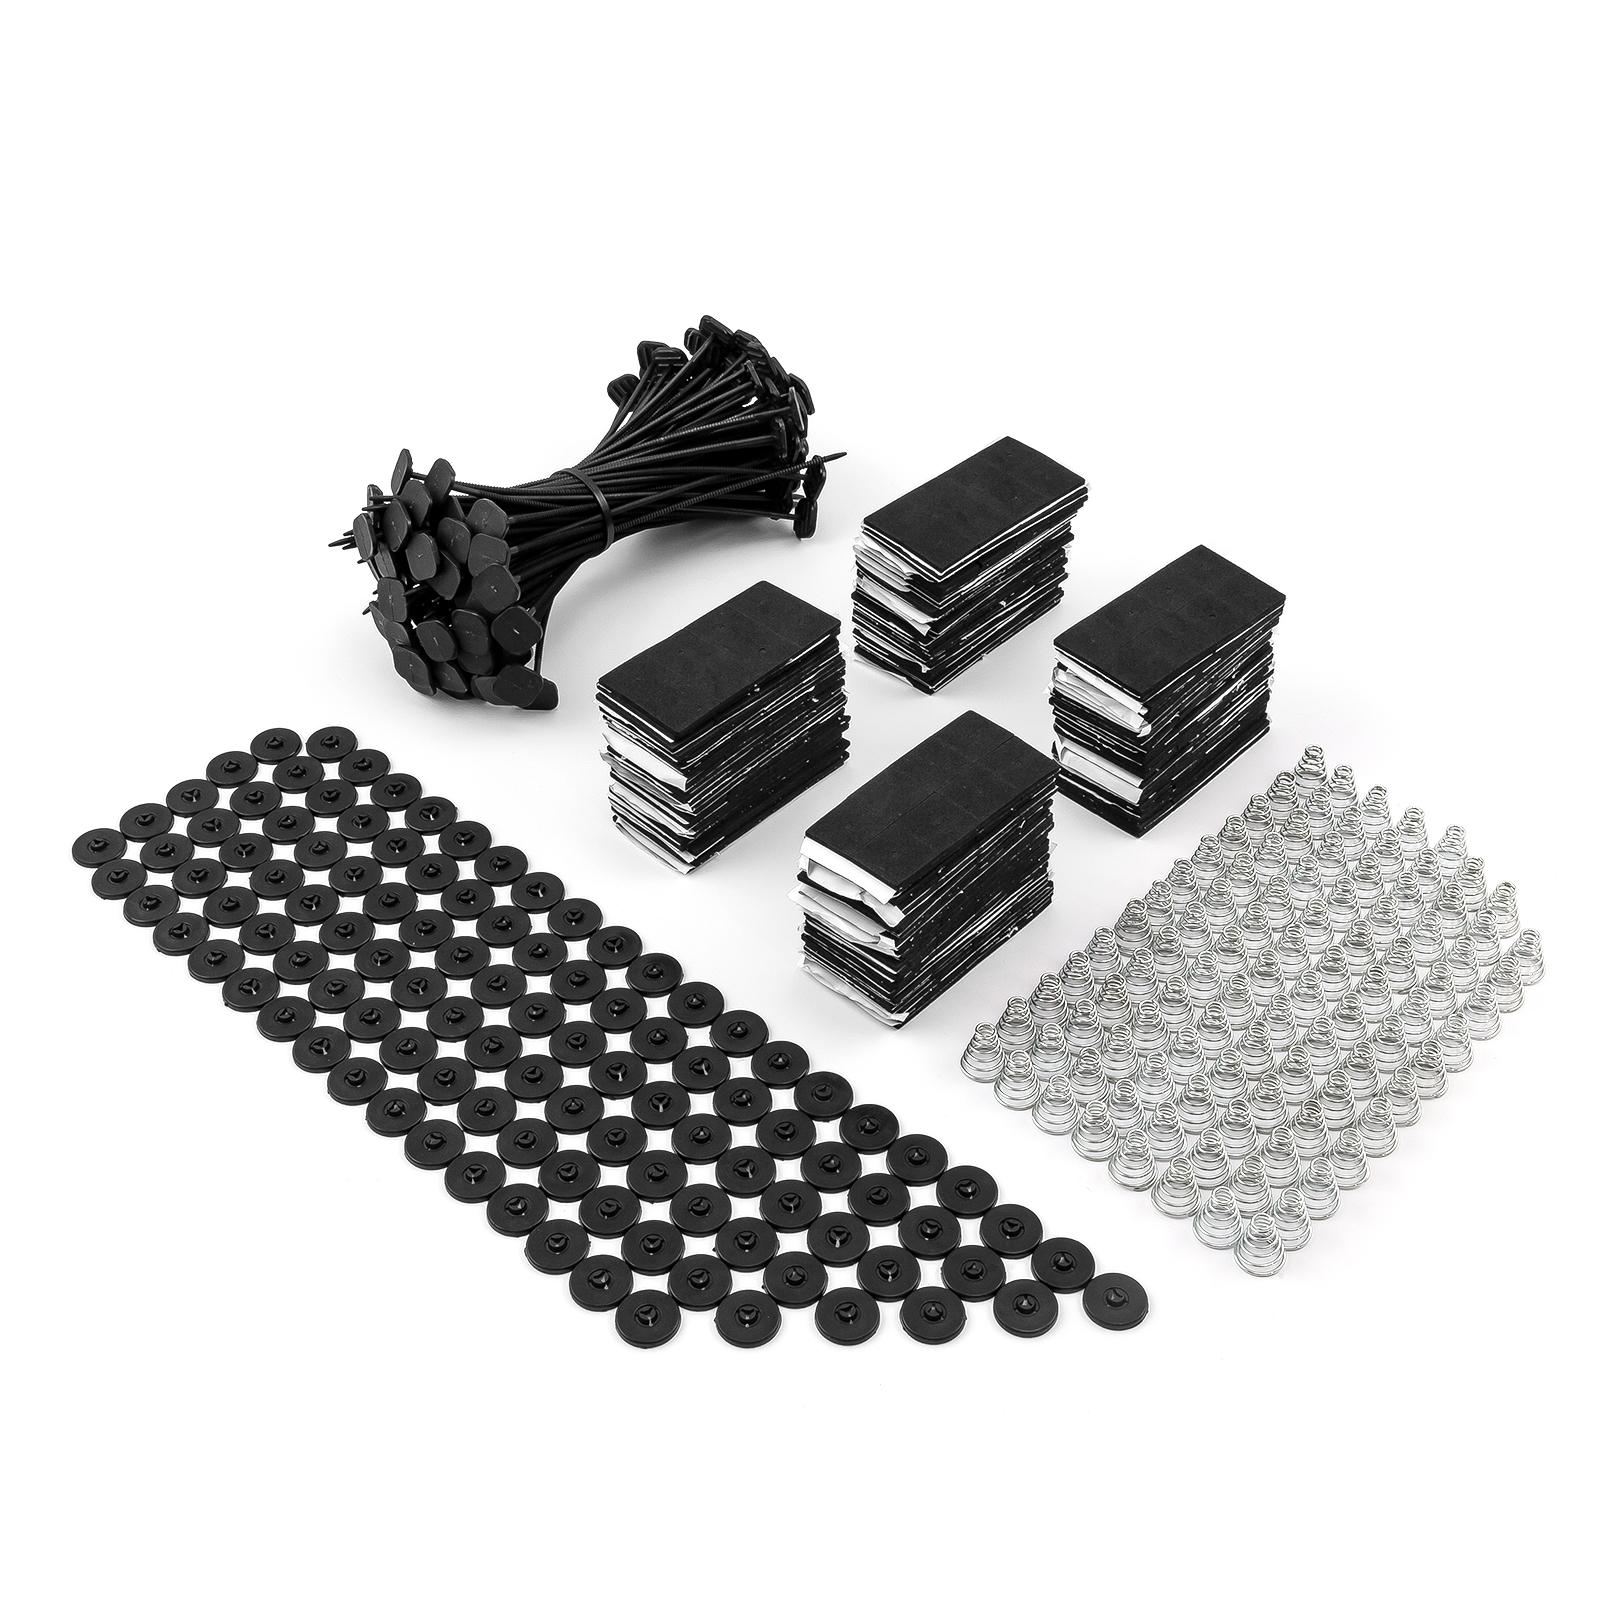 "Universal 4"" 9"" 10"" 12"" 14"" 16"" Electric Fan Install Mounting Zip Ties Kit - 100pcs"